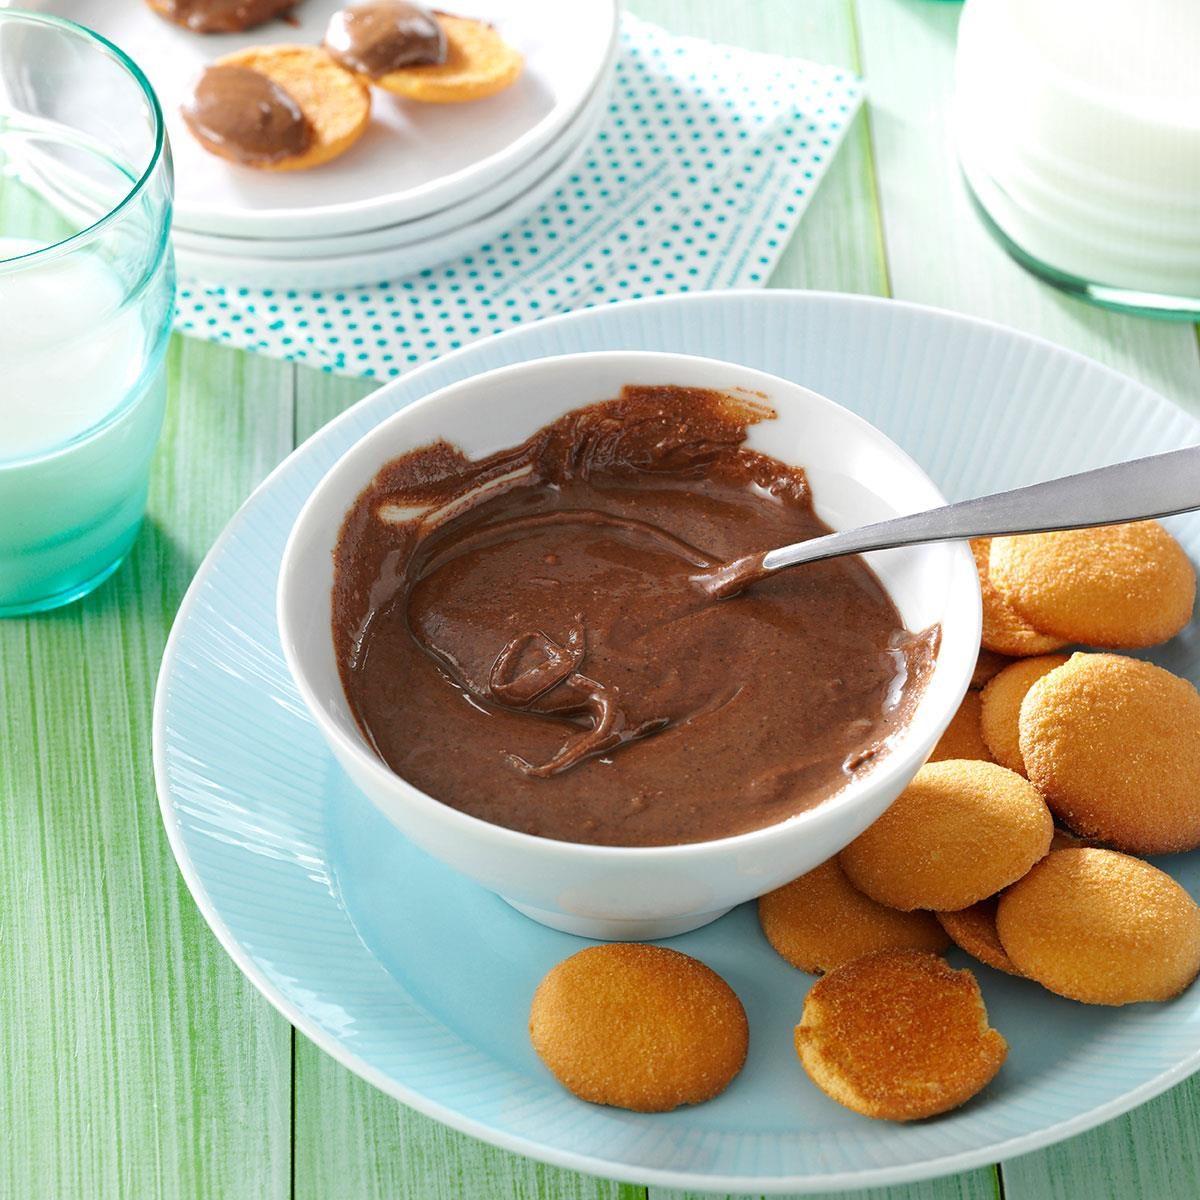 Hazelnut Kitchen: Chocolate-Hazelnut Butter Recipe